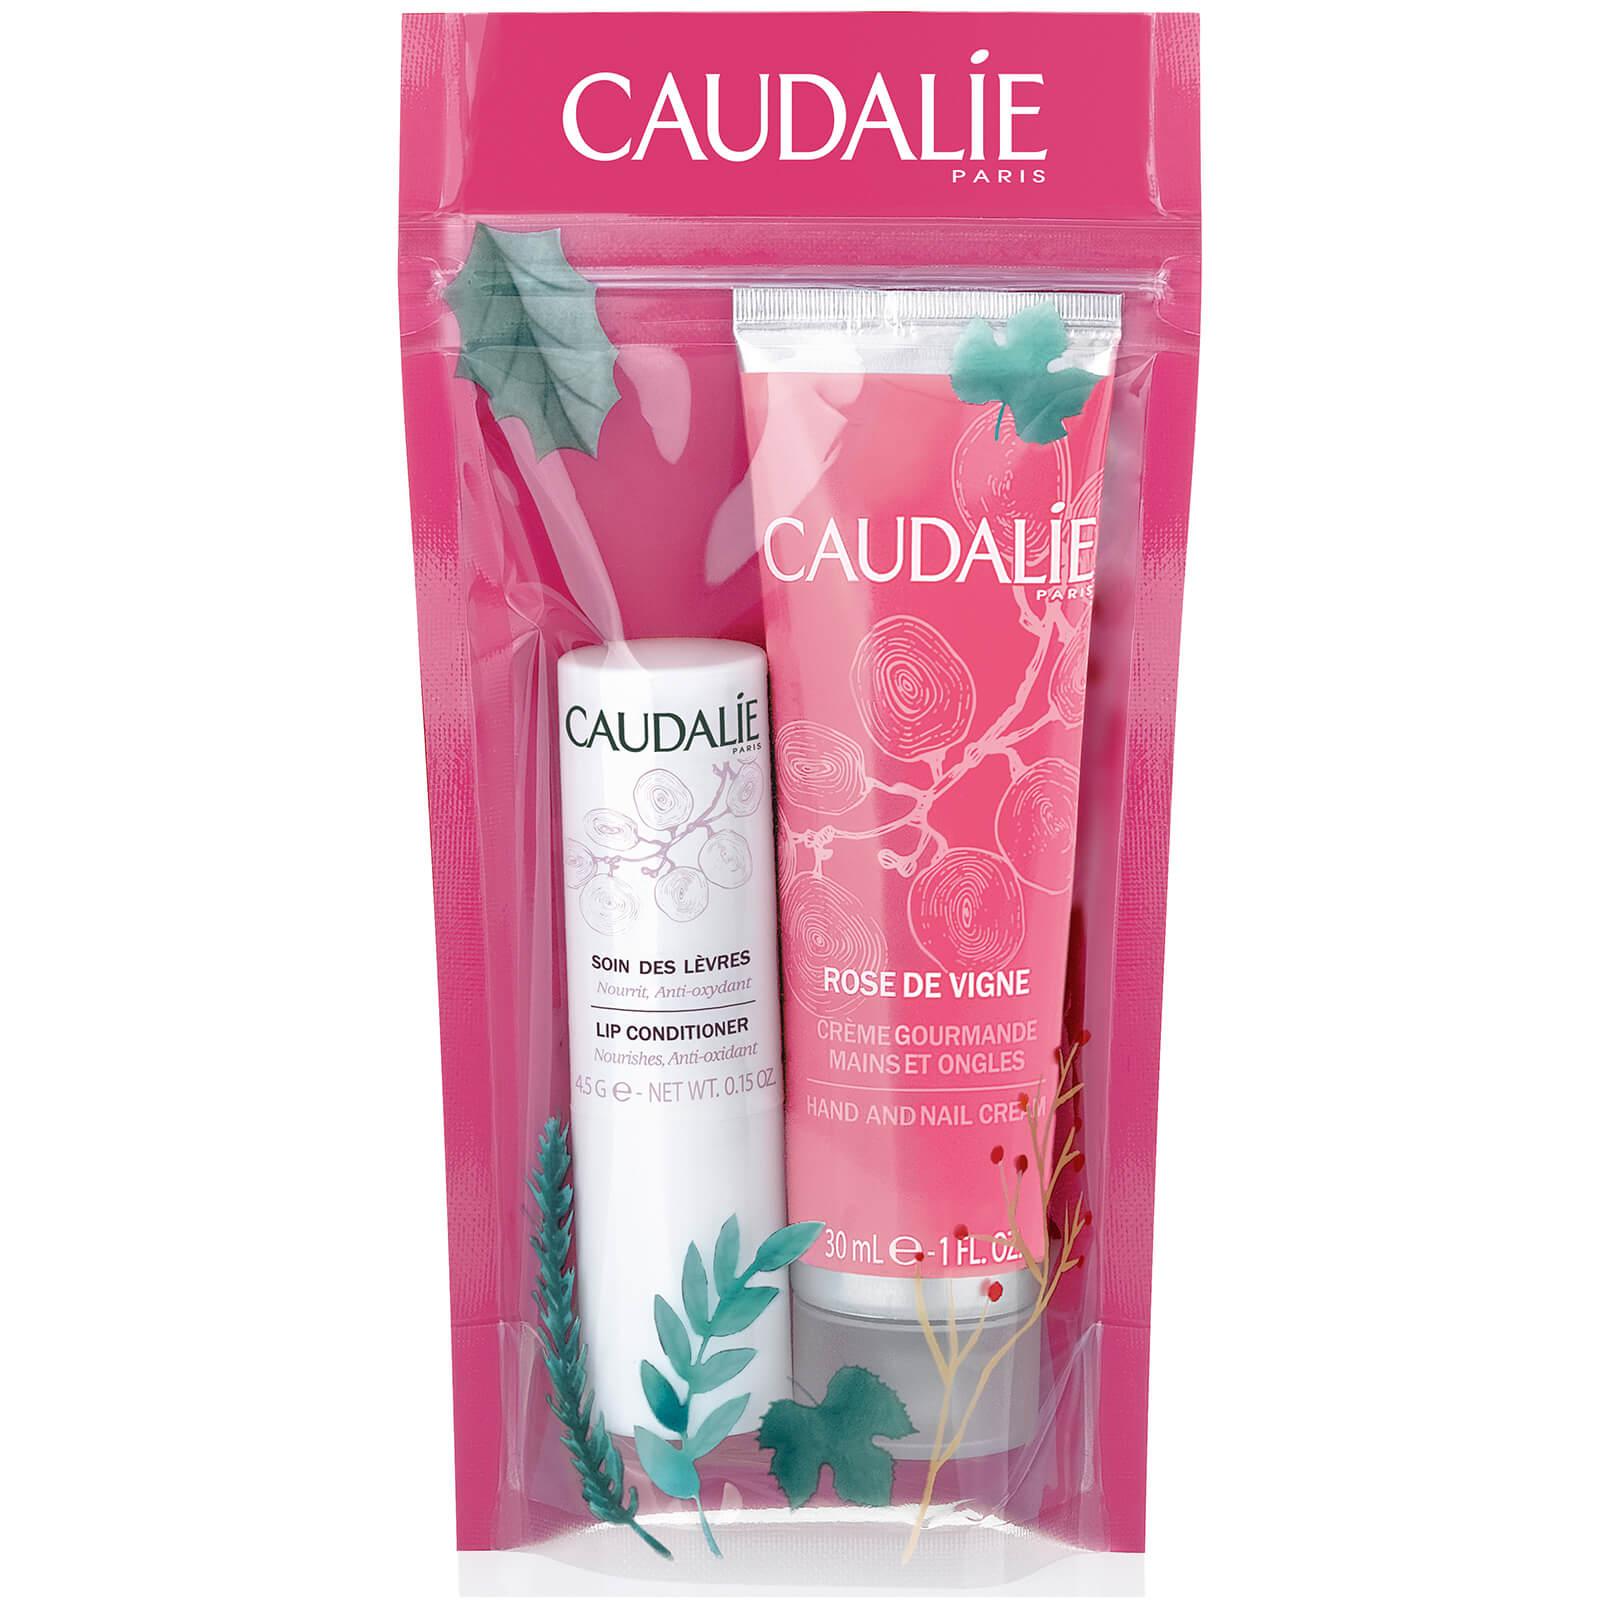 Caudalie 欧缇丽 玫瑰护手霜+润唇膏套装